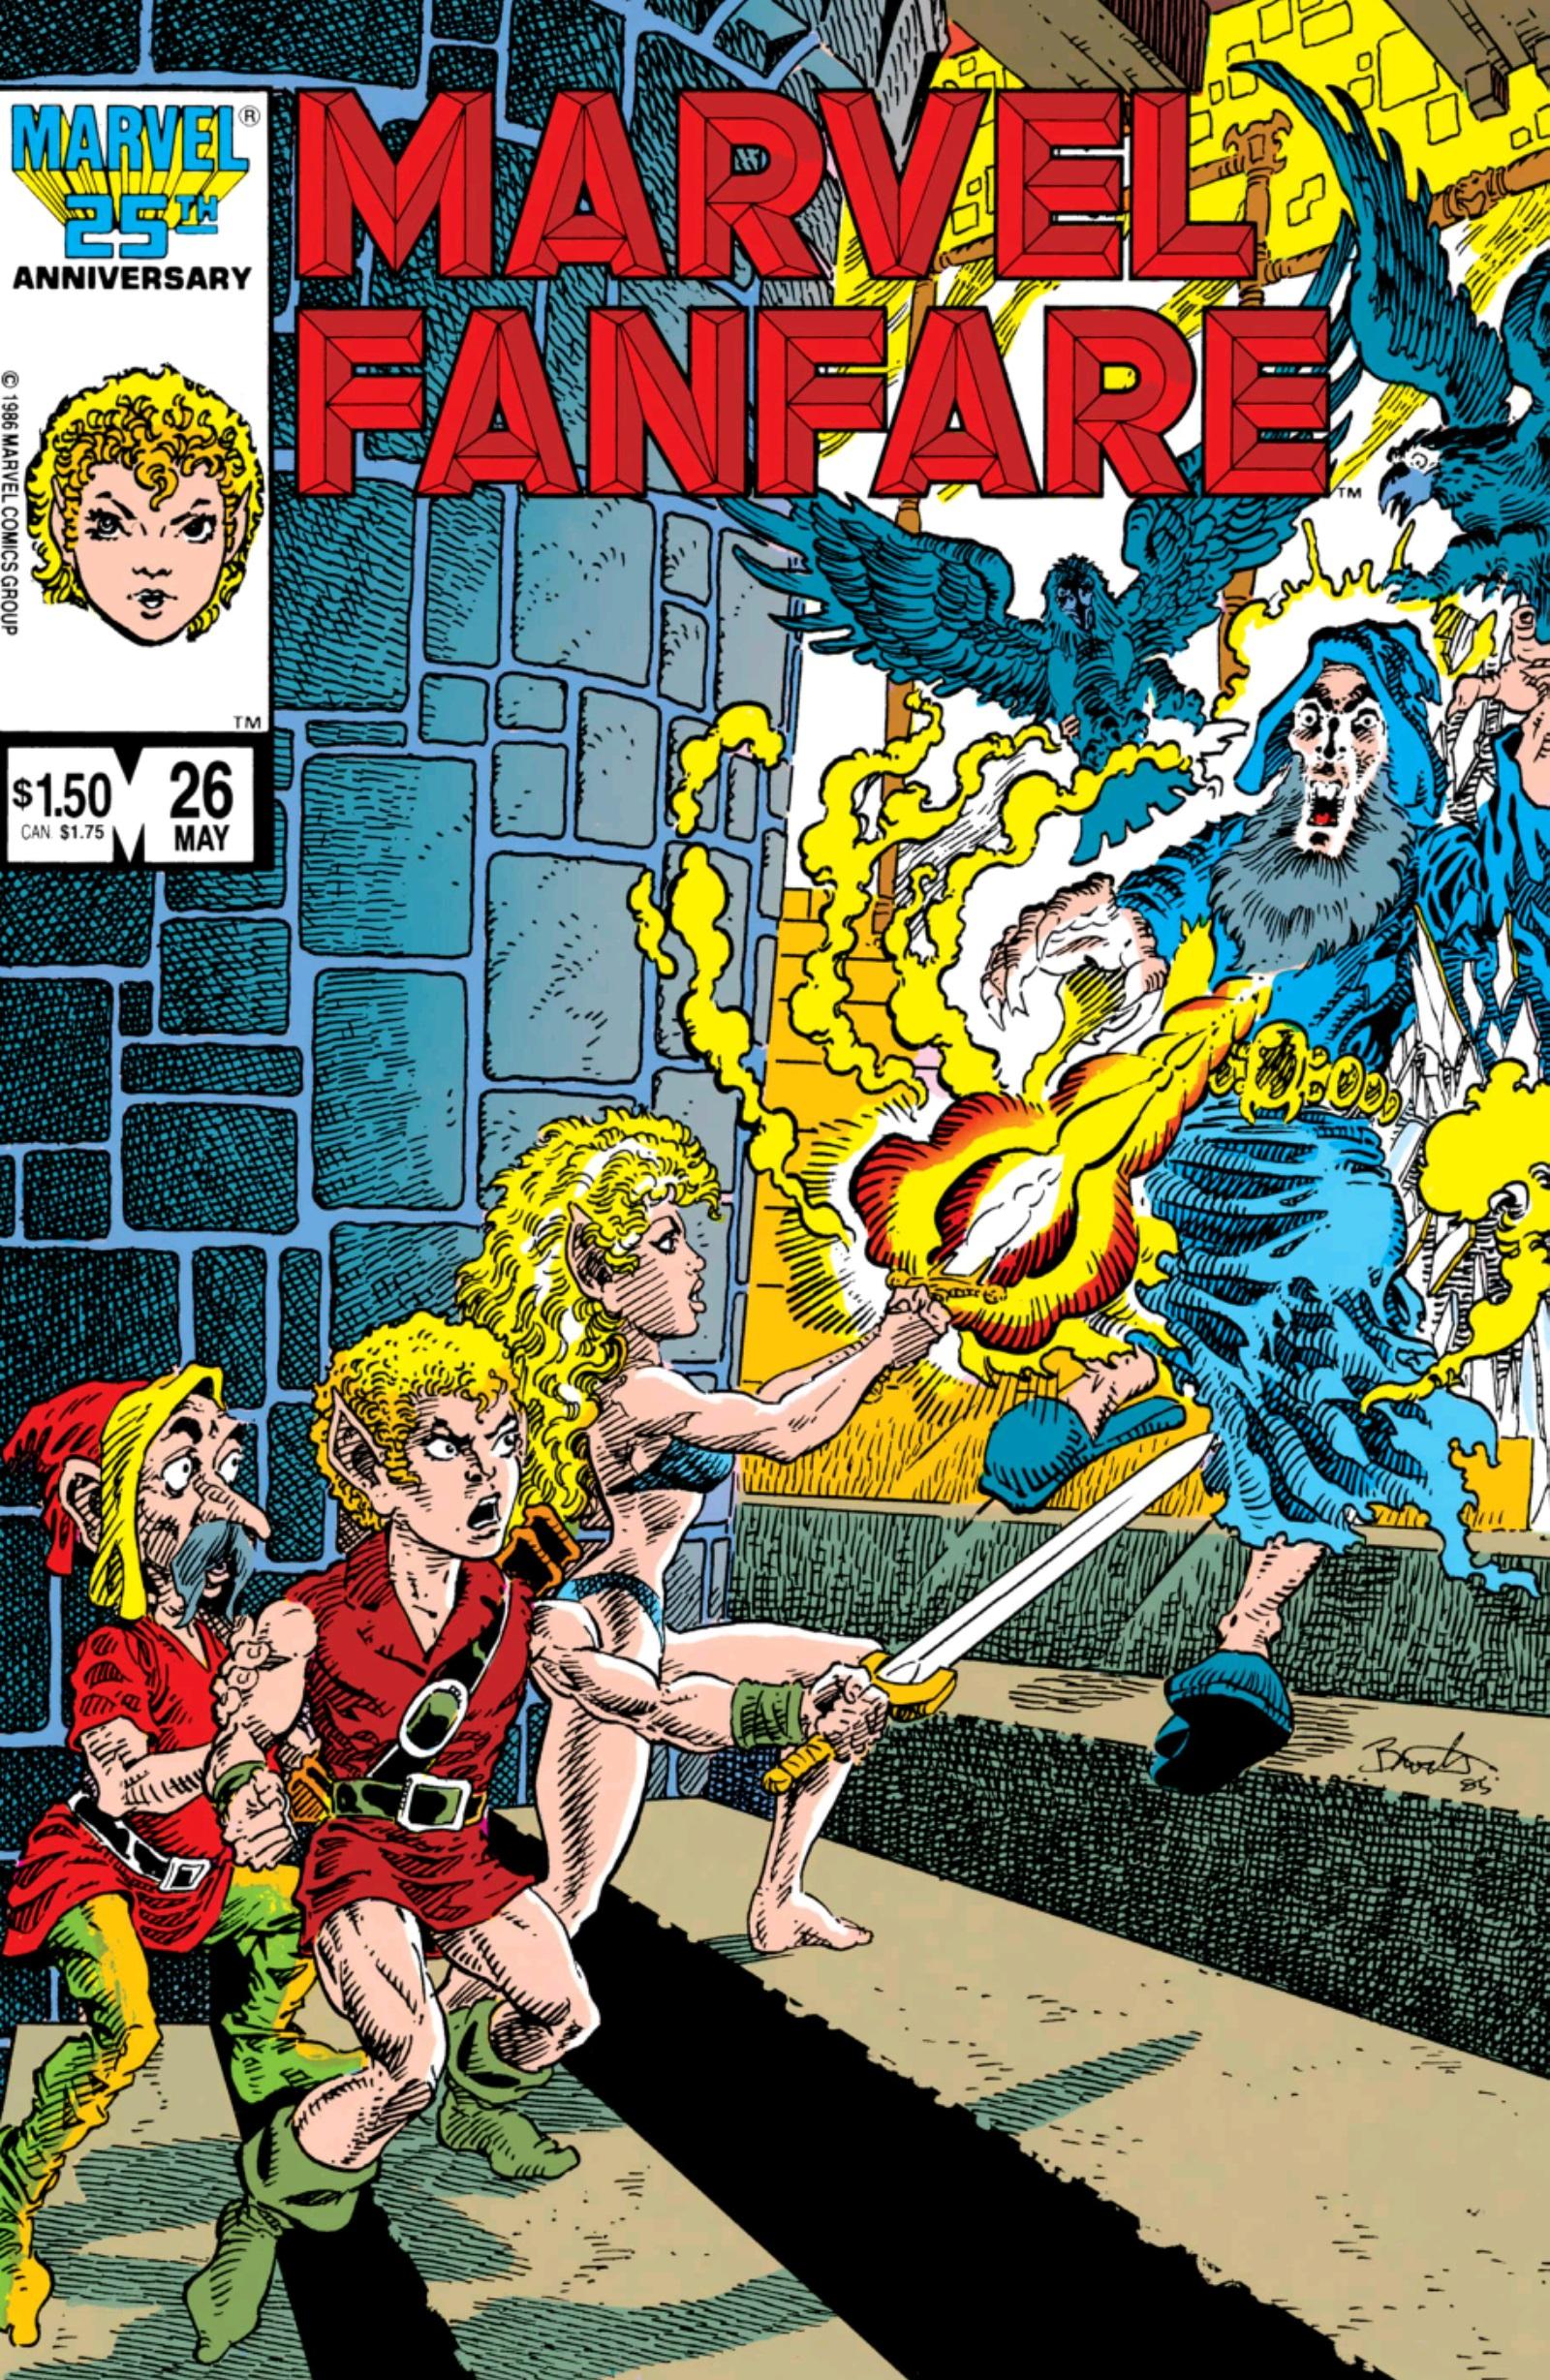 Marvel Fanfare Vol 1 26